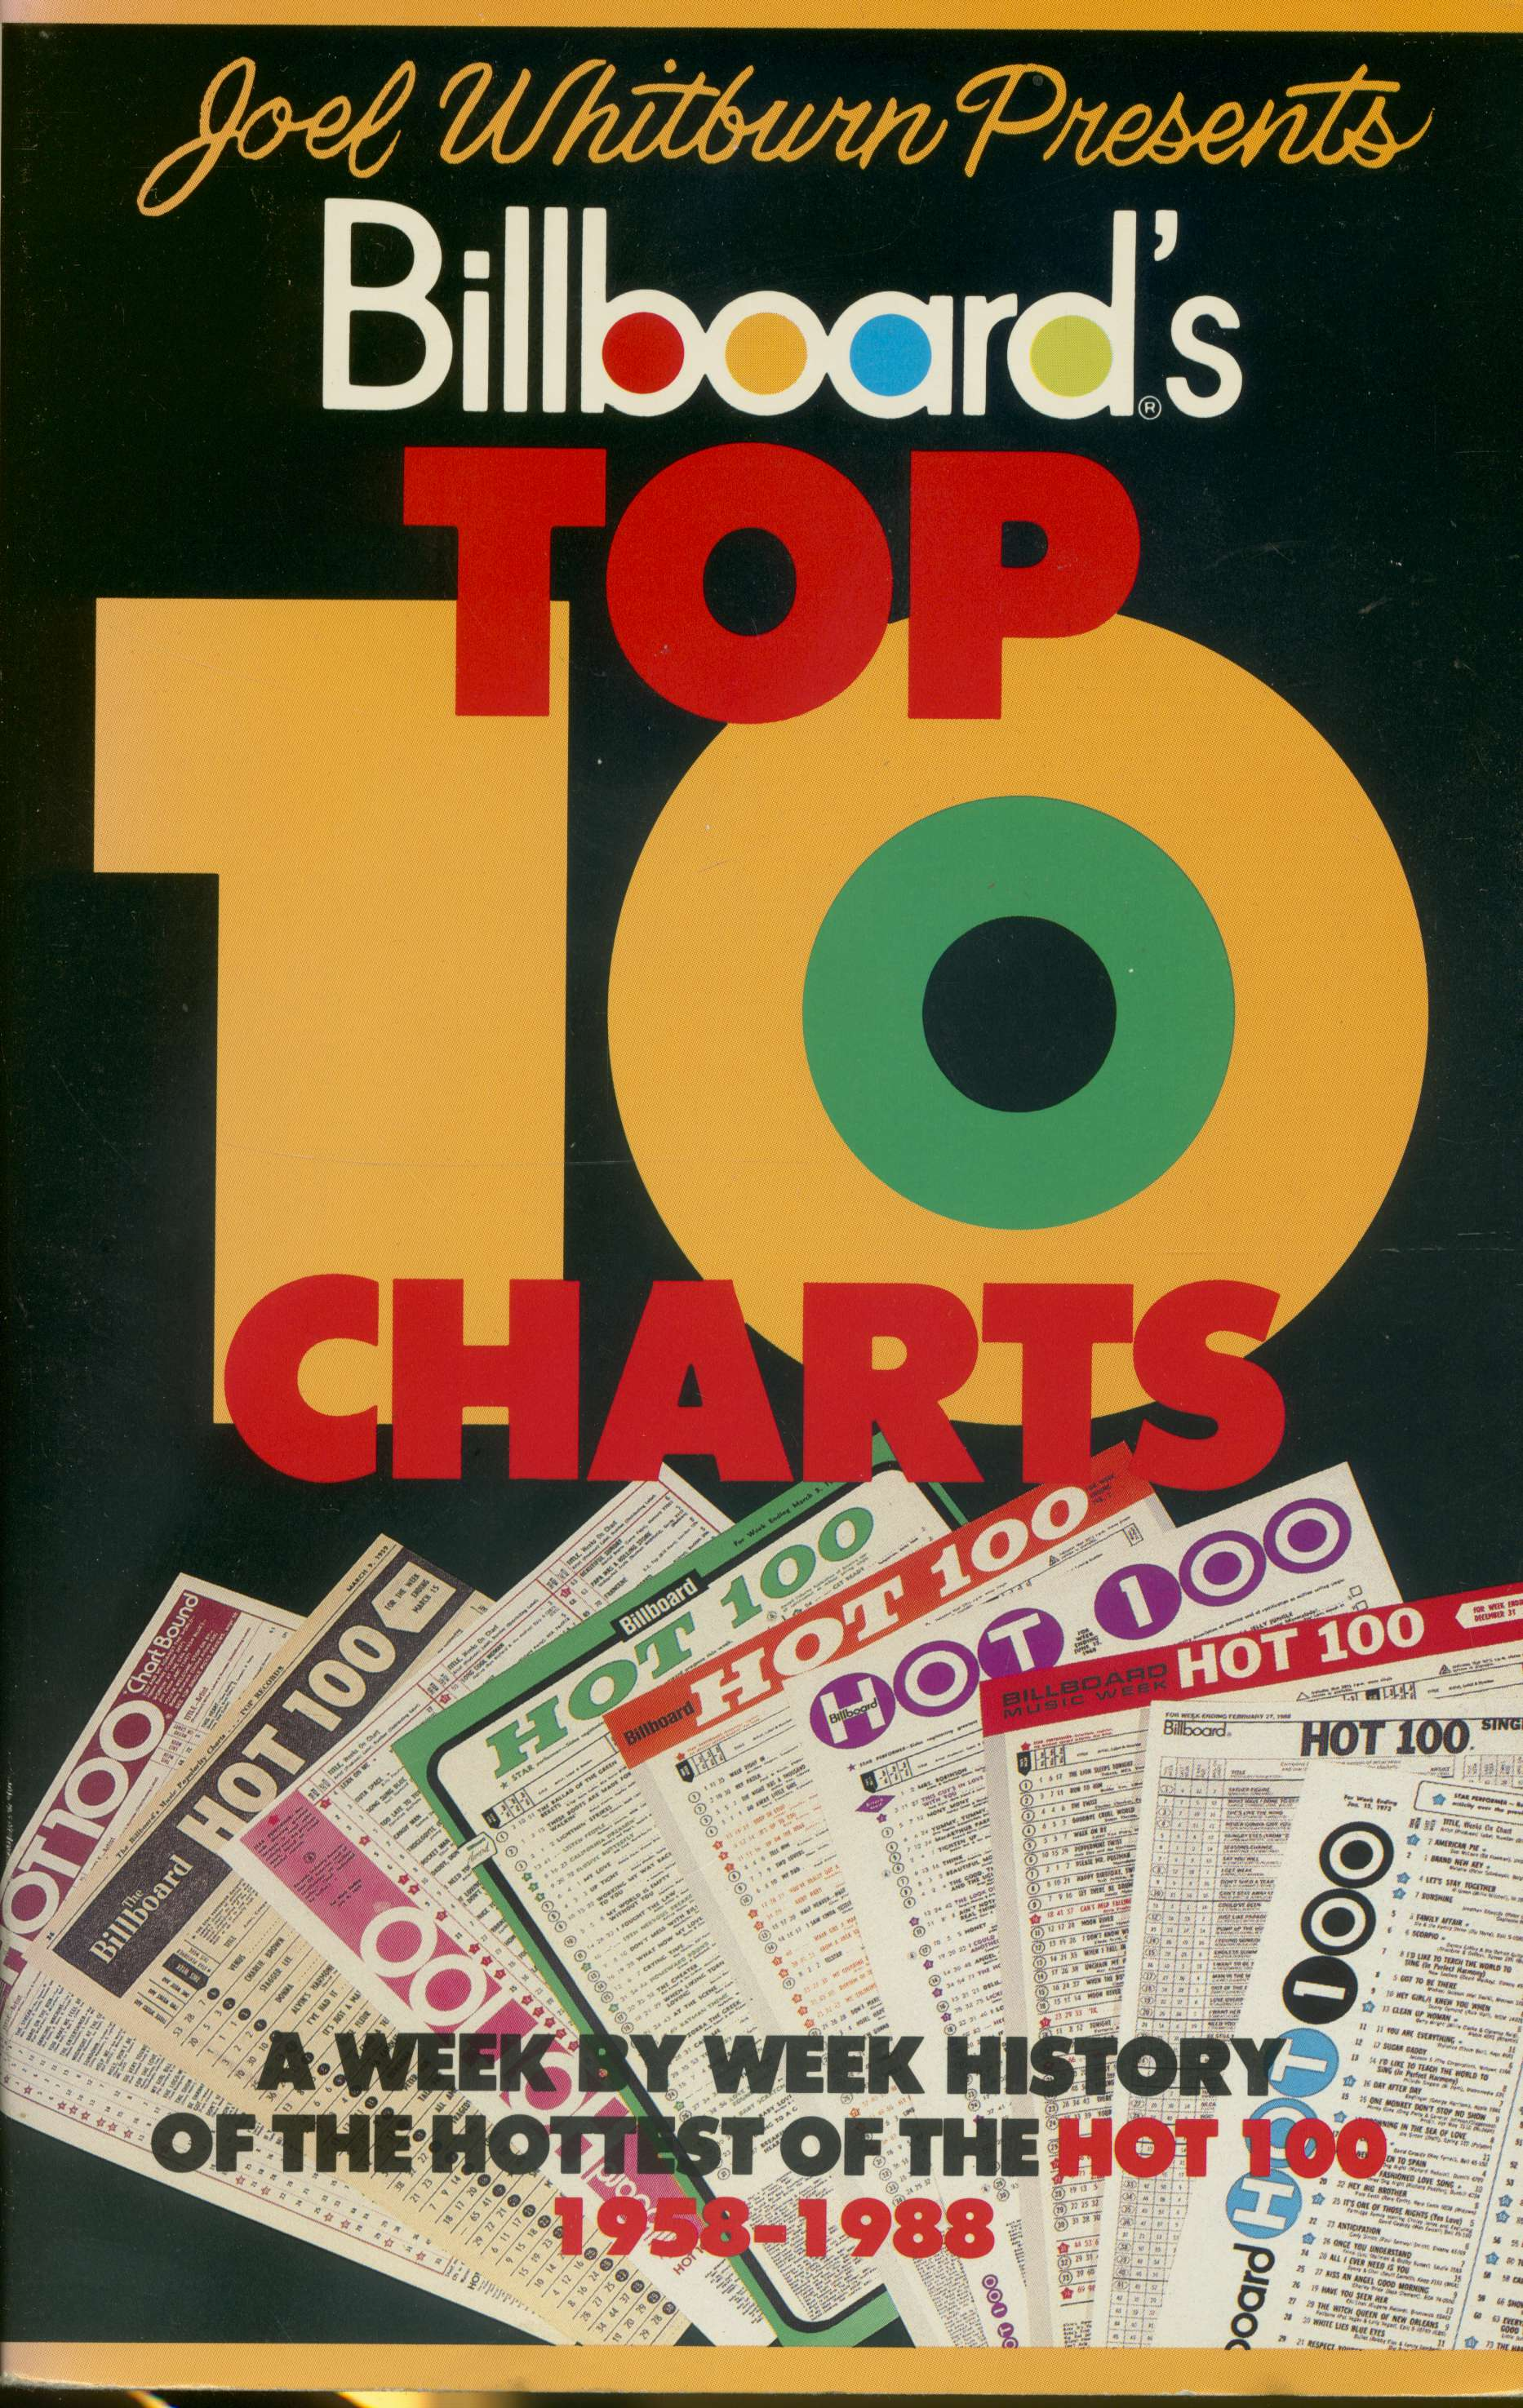 Joel Whitburn Billboard Top 10 Charts